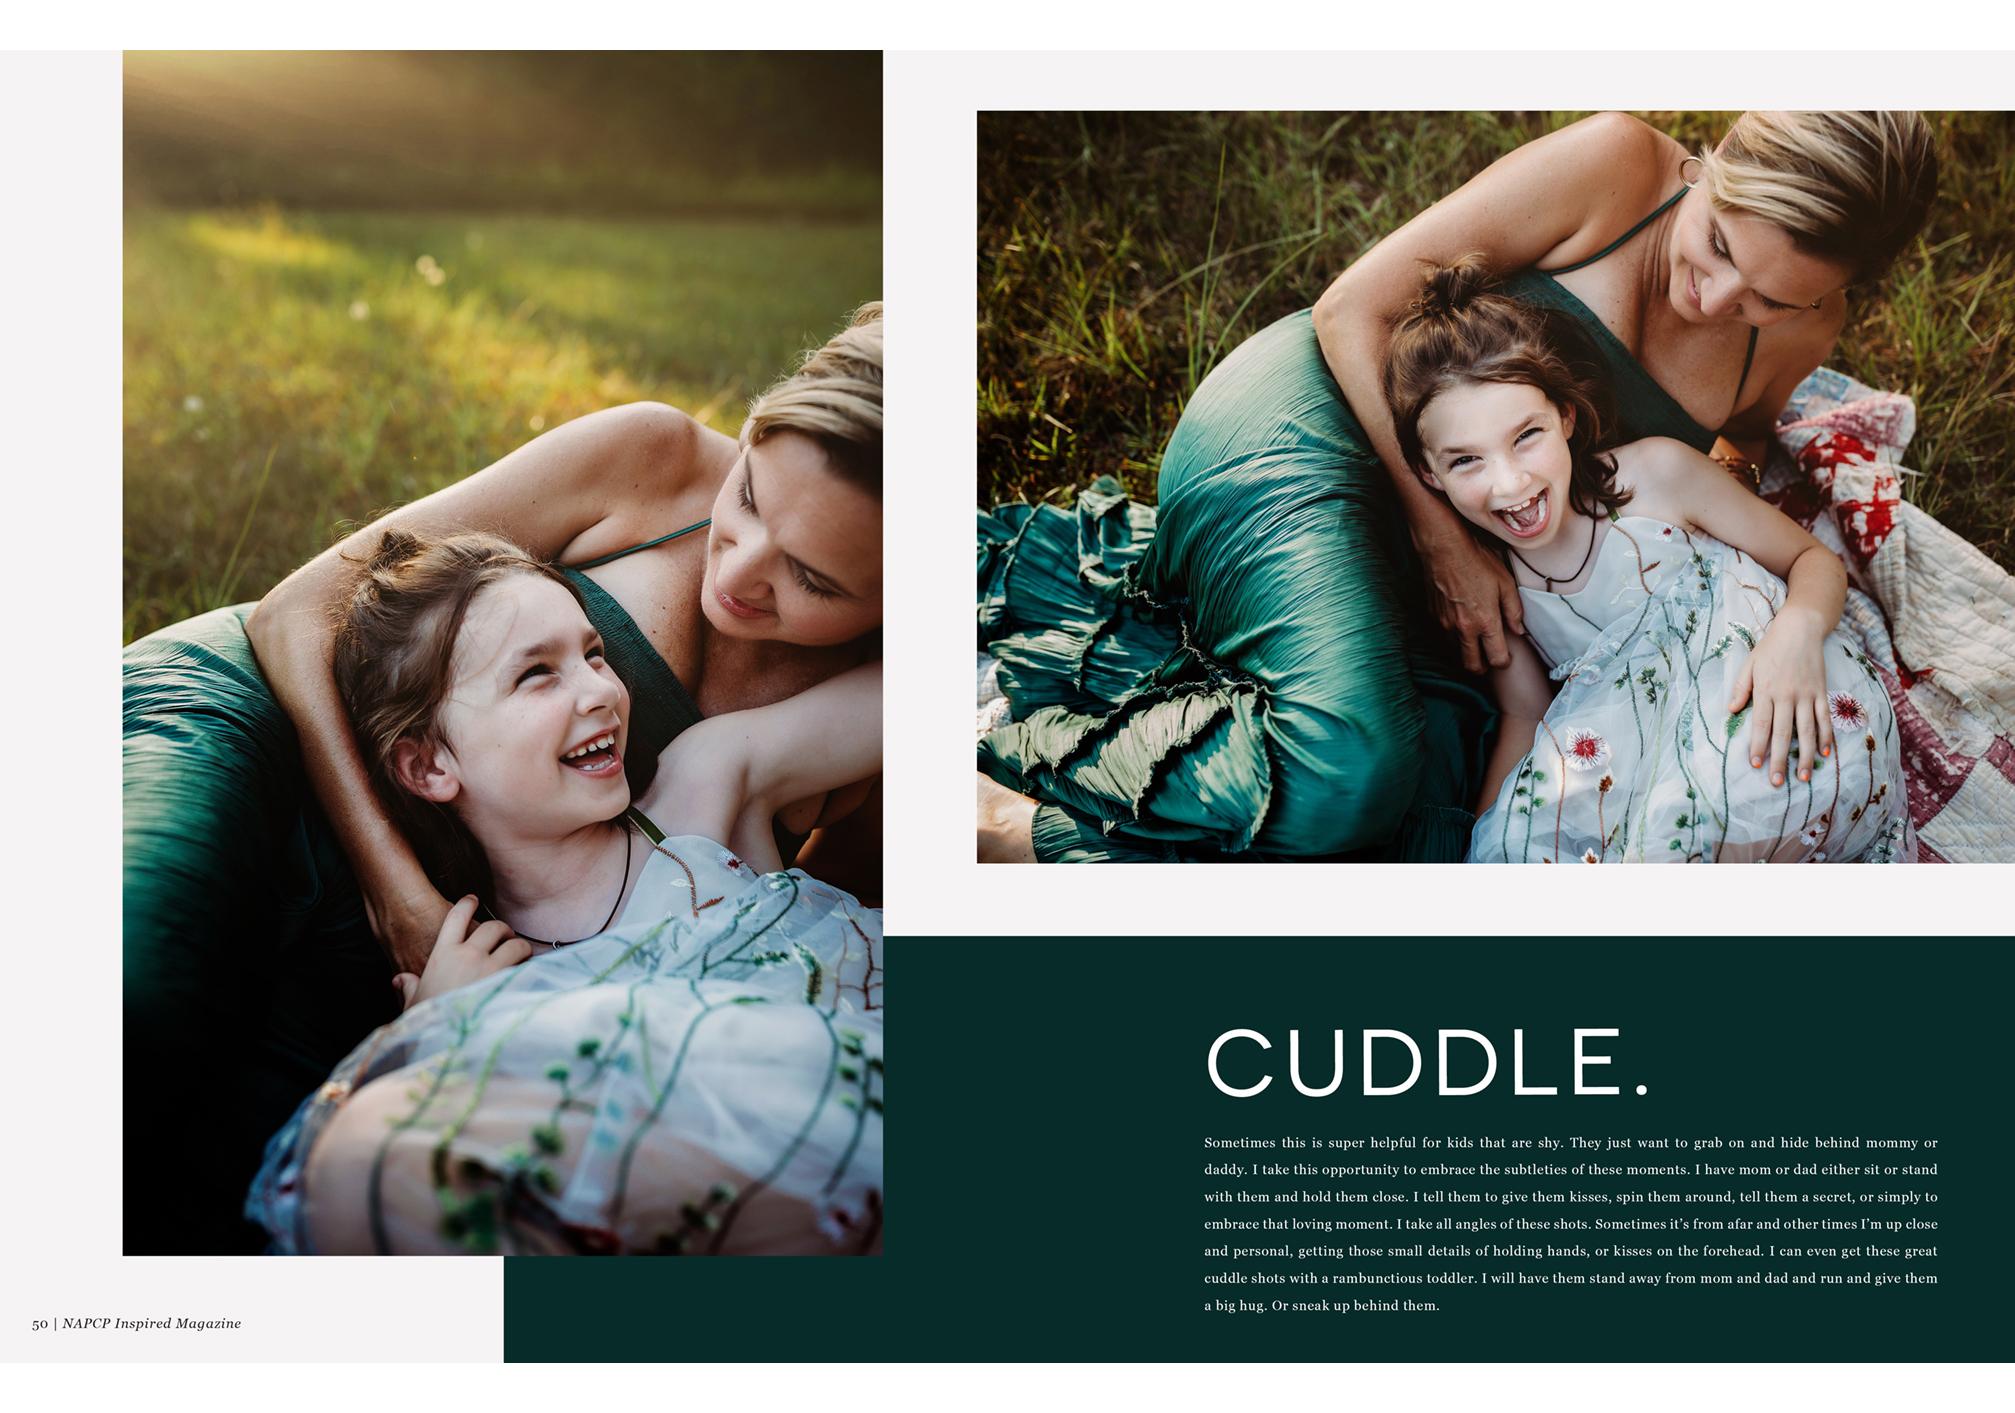 NAPCP Inspired Magazine, CUDDLE spread by Gina Whalen